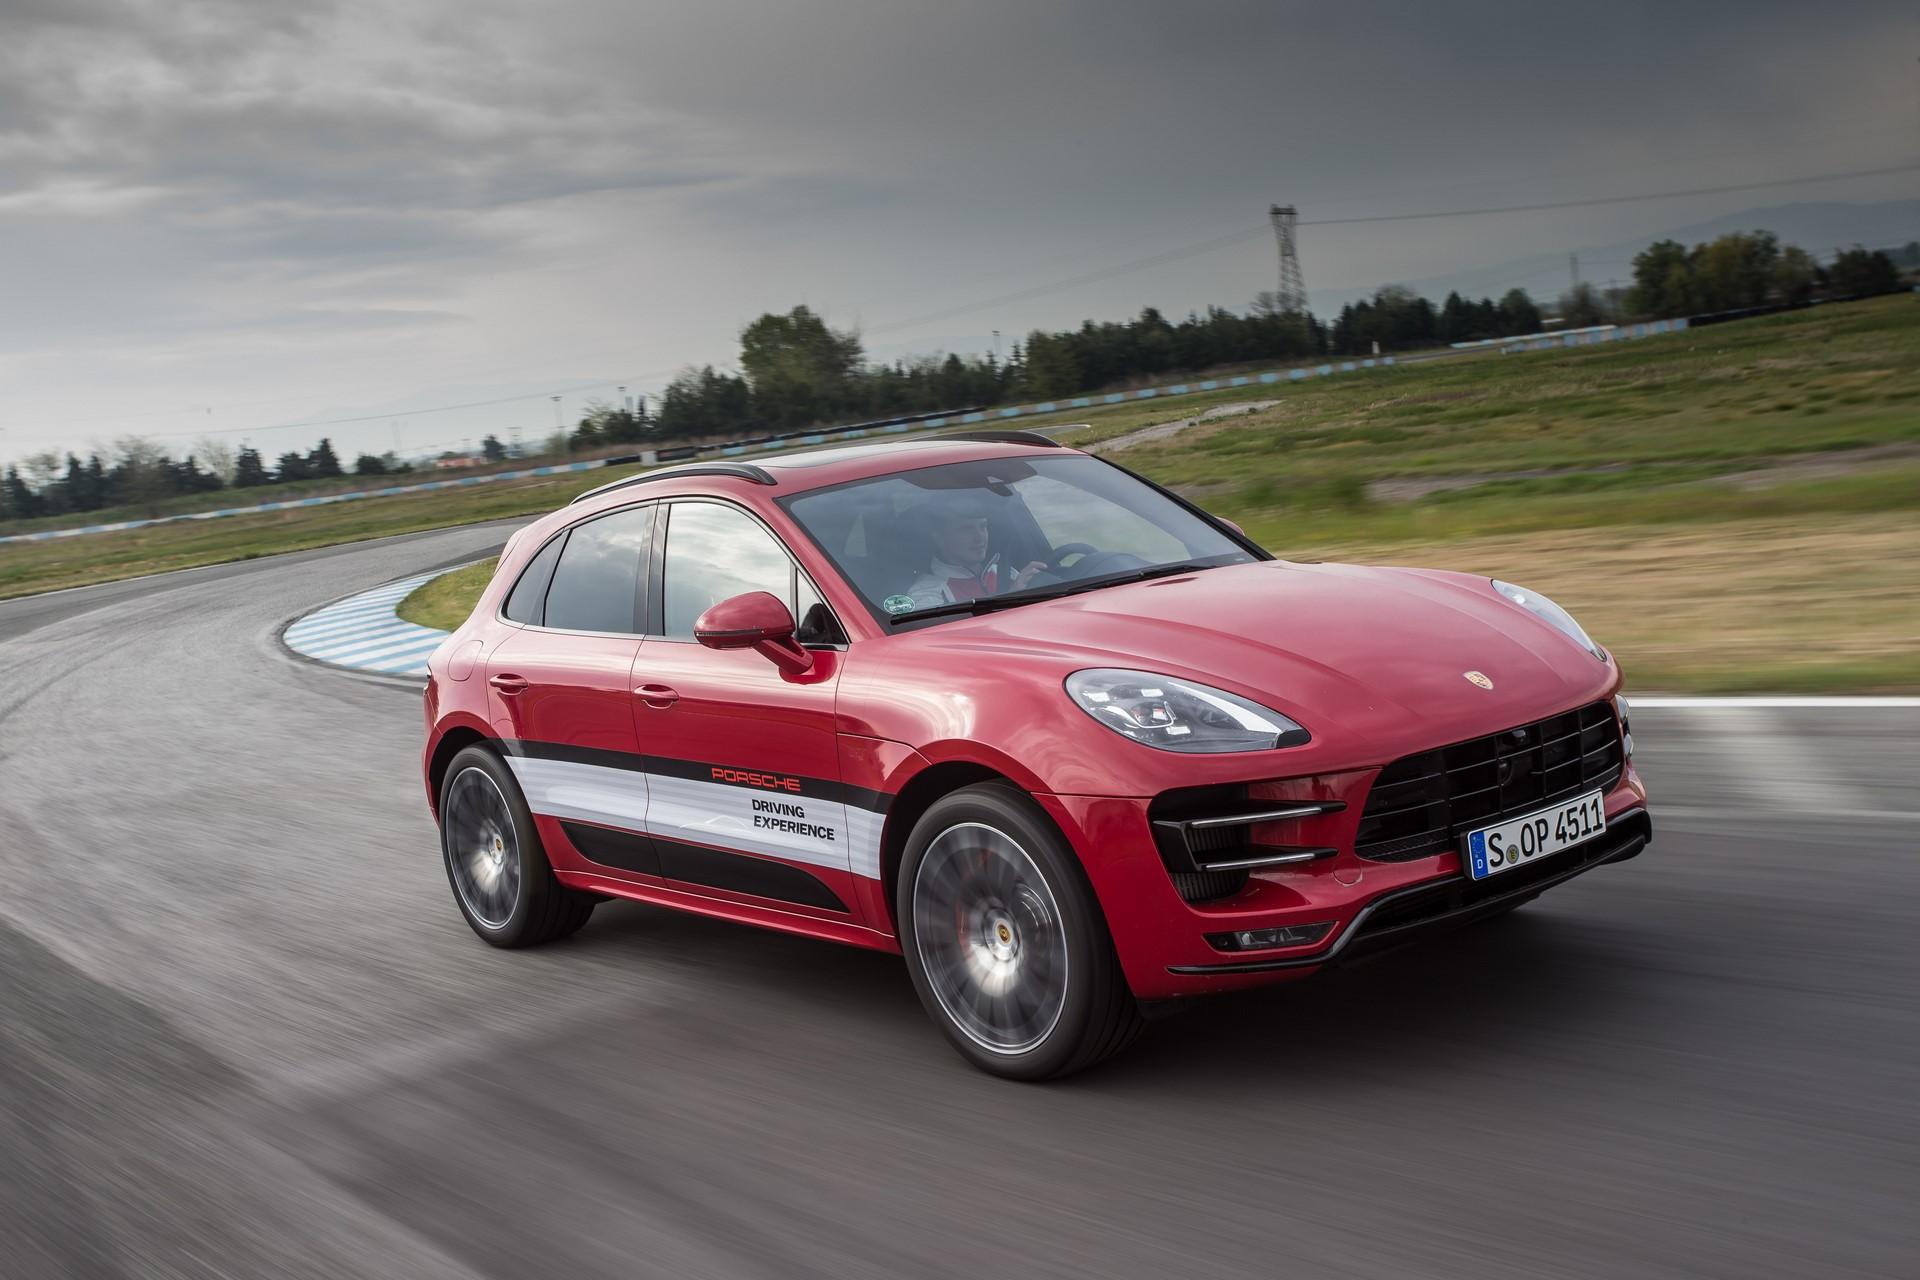 Porsche Driving Experience 2017 Serres (58)